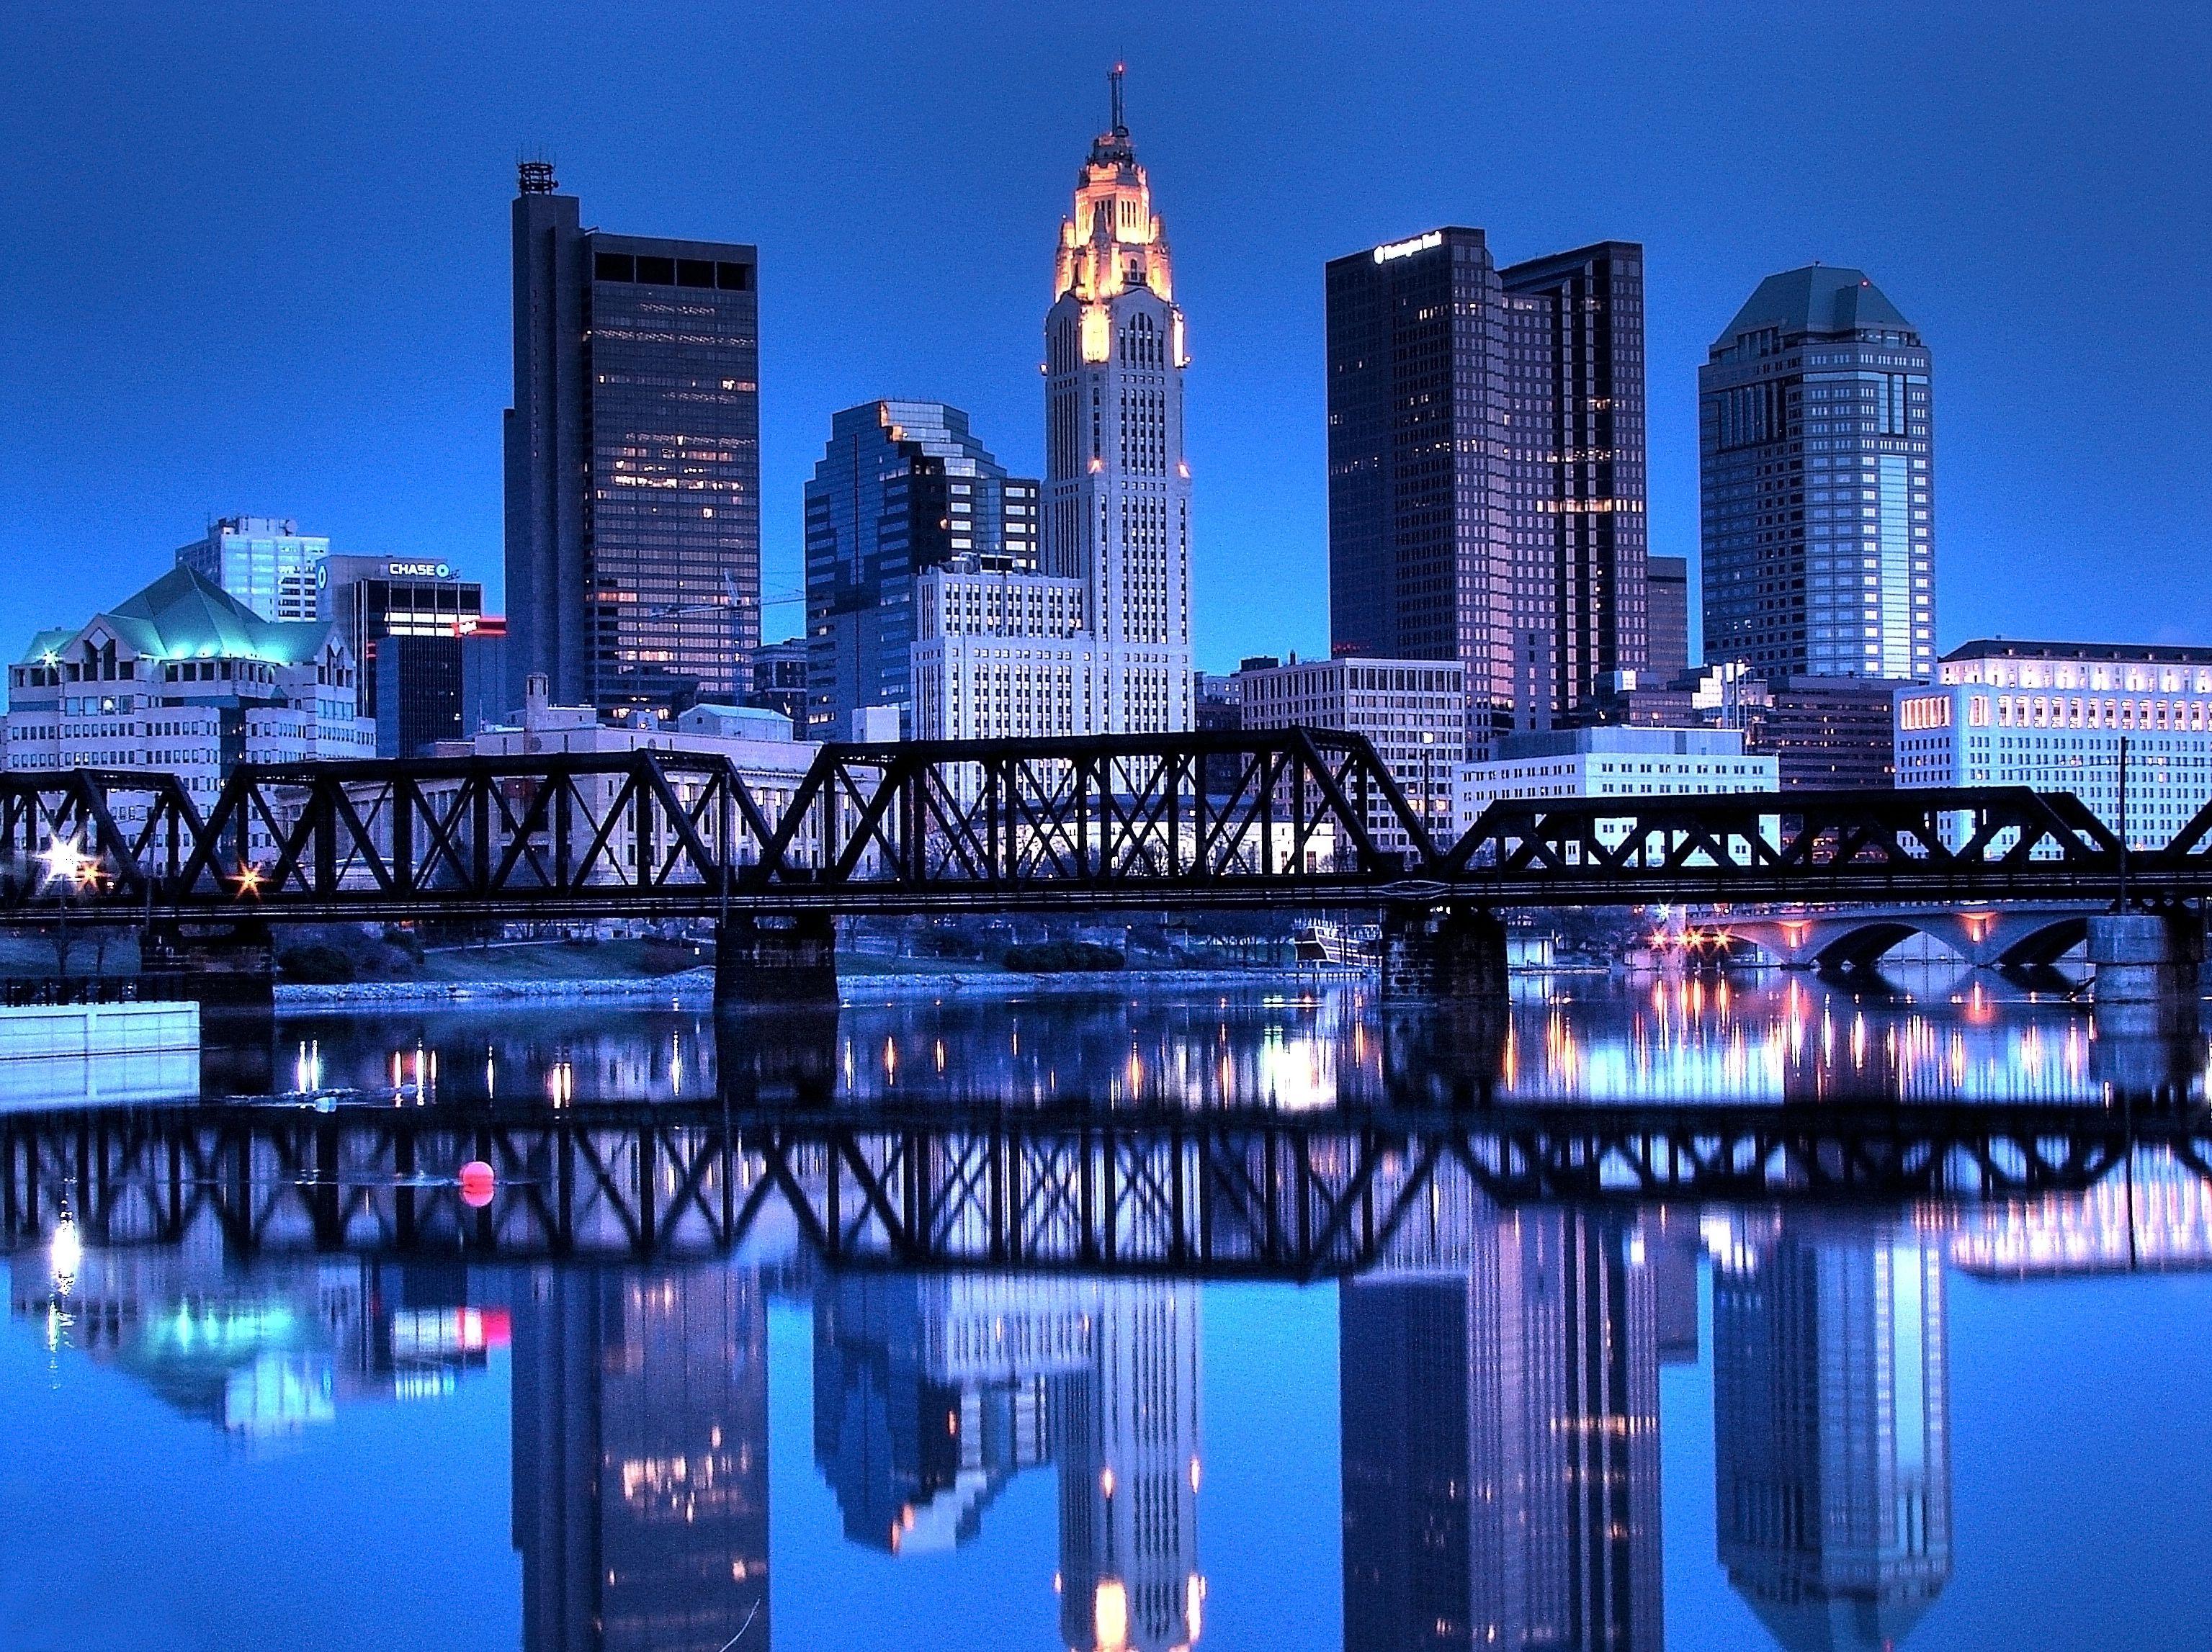 Columbus, OH Skyline Reflected